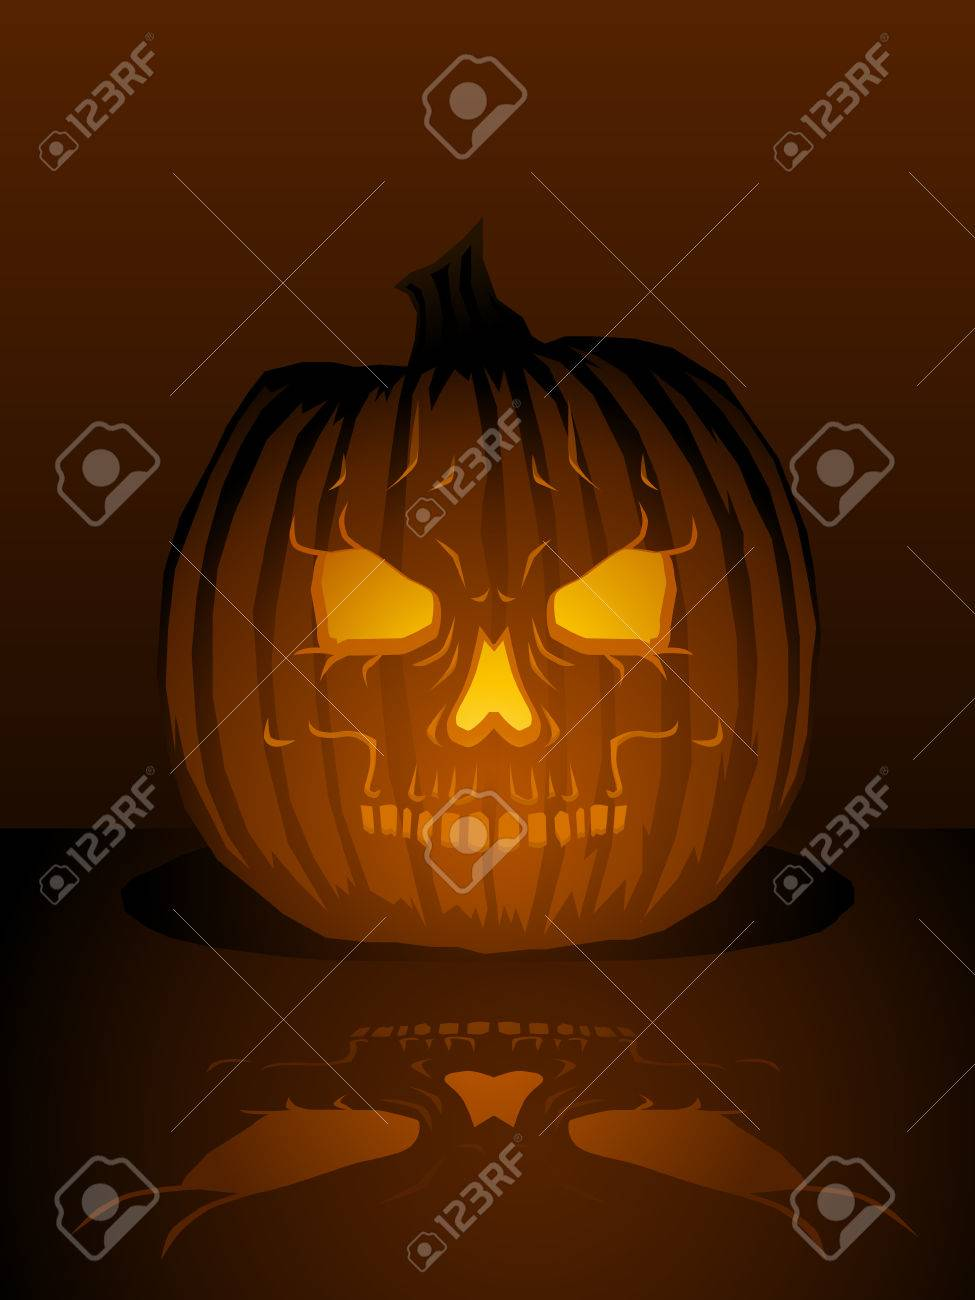 Skull Jack O Lantern Illustration Royalty Free Cliparts Vectors And Stock Illustration Image 5319336